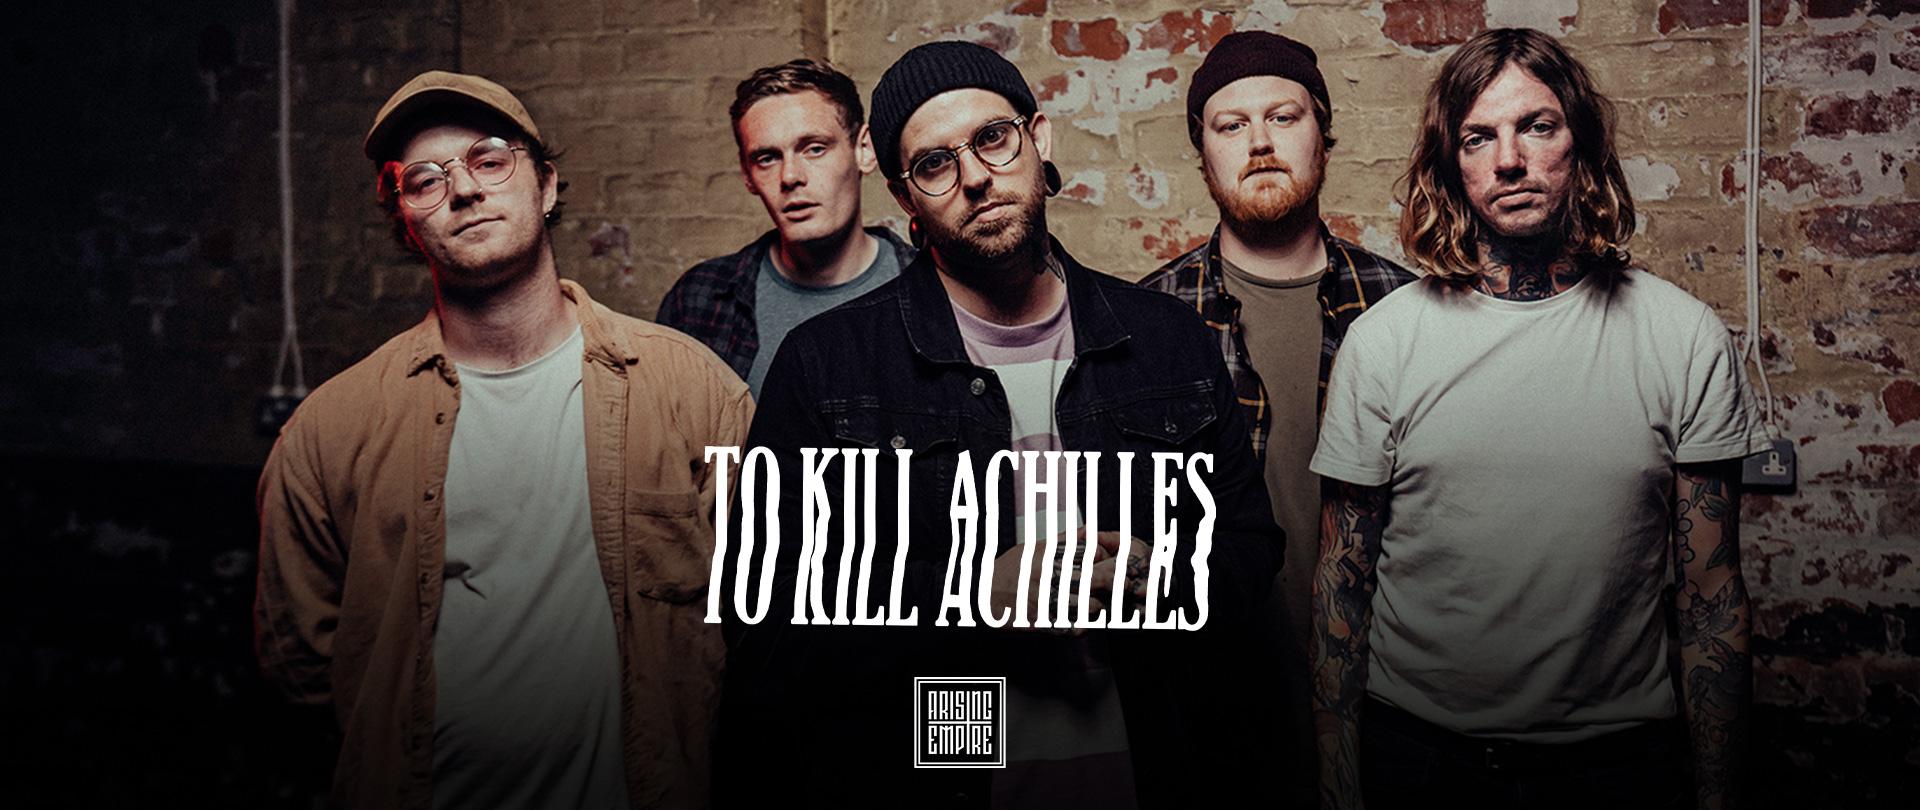 To Kill Achilles at Arising Empire • Offizieller Online Shop